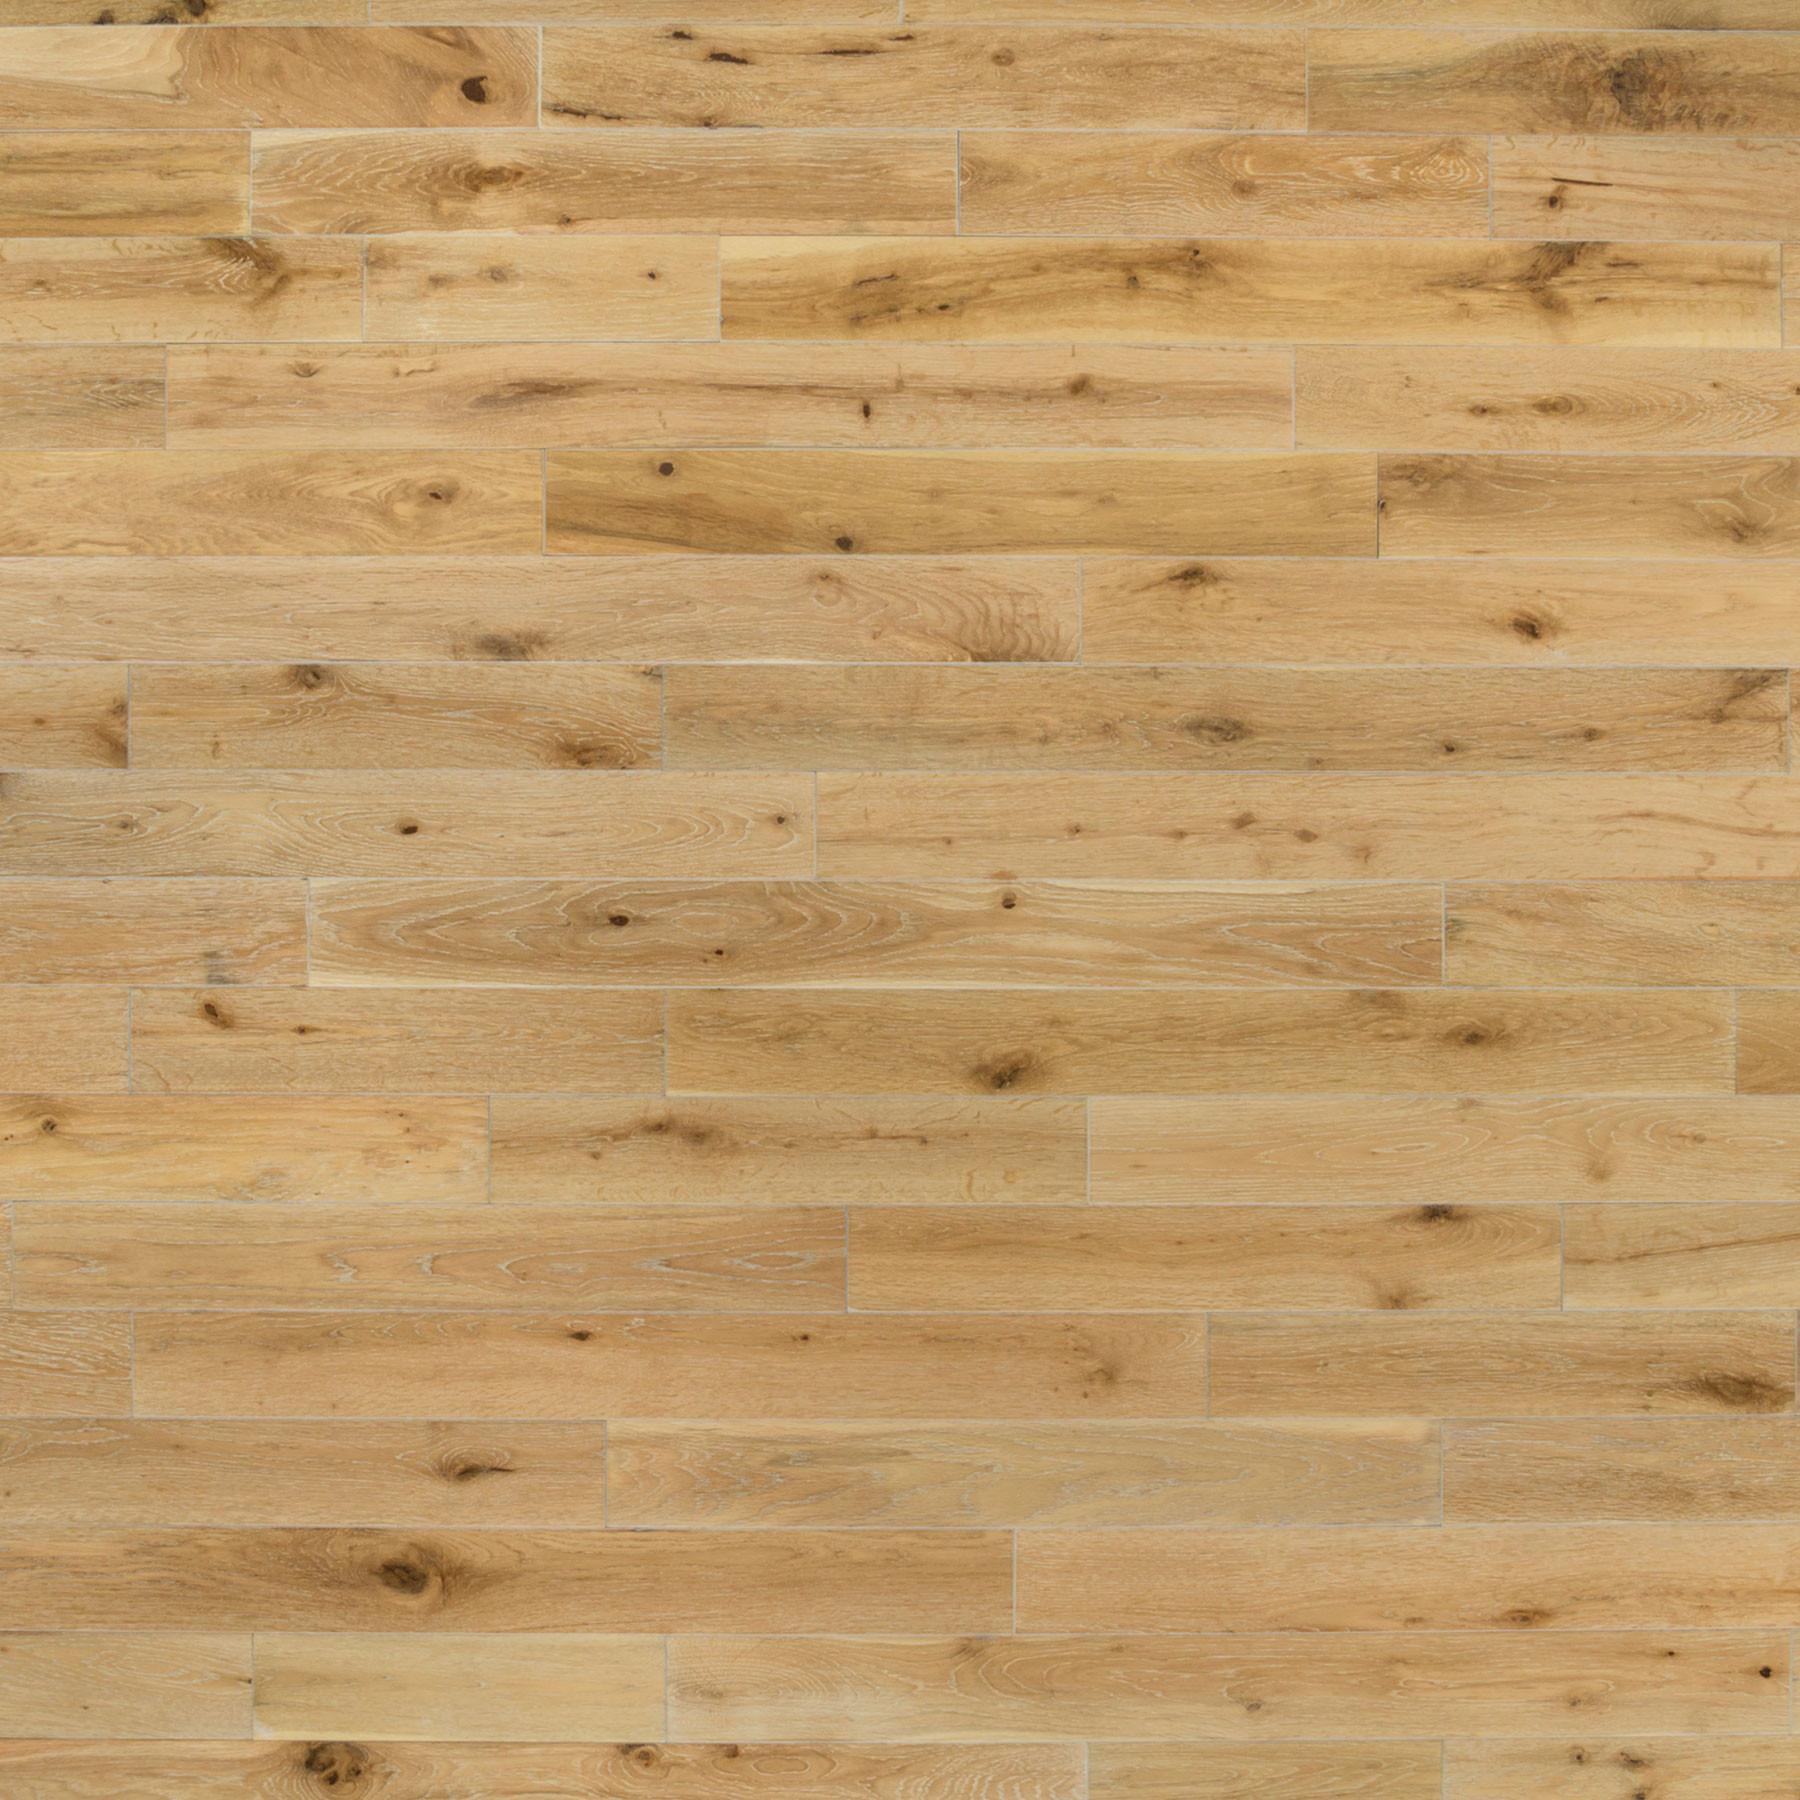 nails or staples for 3 4 hardwood flooring of harbor oak 3 1 2″ white oak white washed etx surfaces inside harbor oak 3 1 2″ white oak white washed